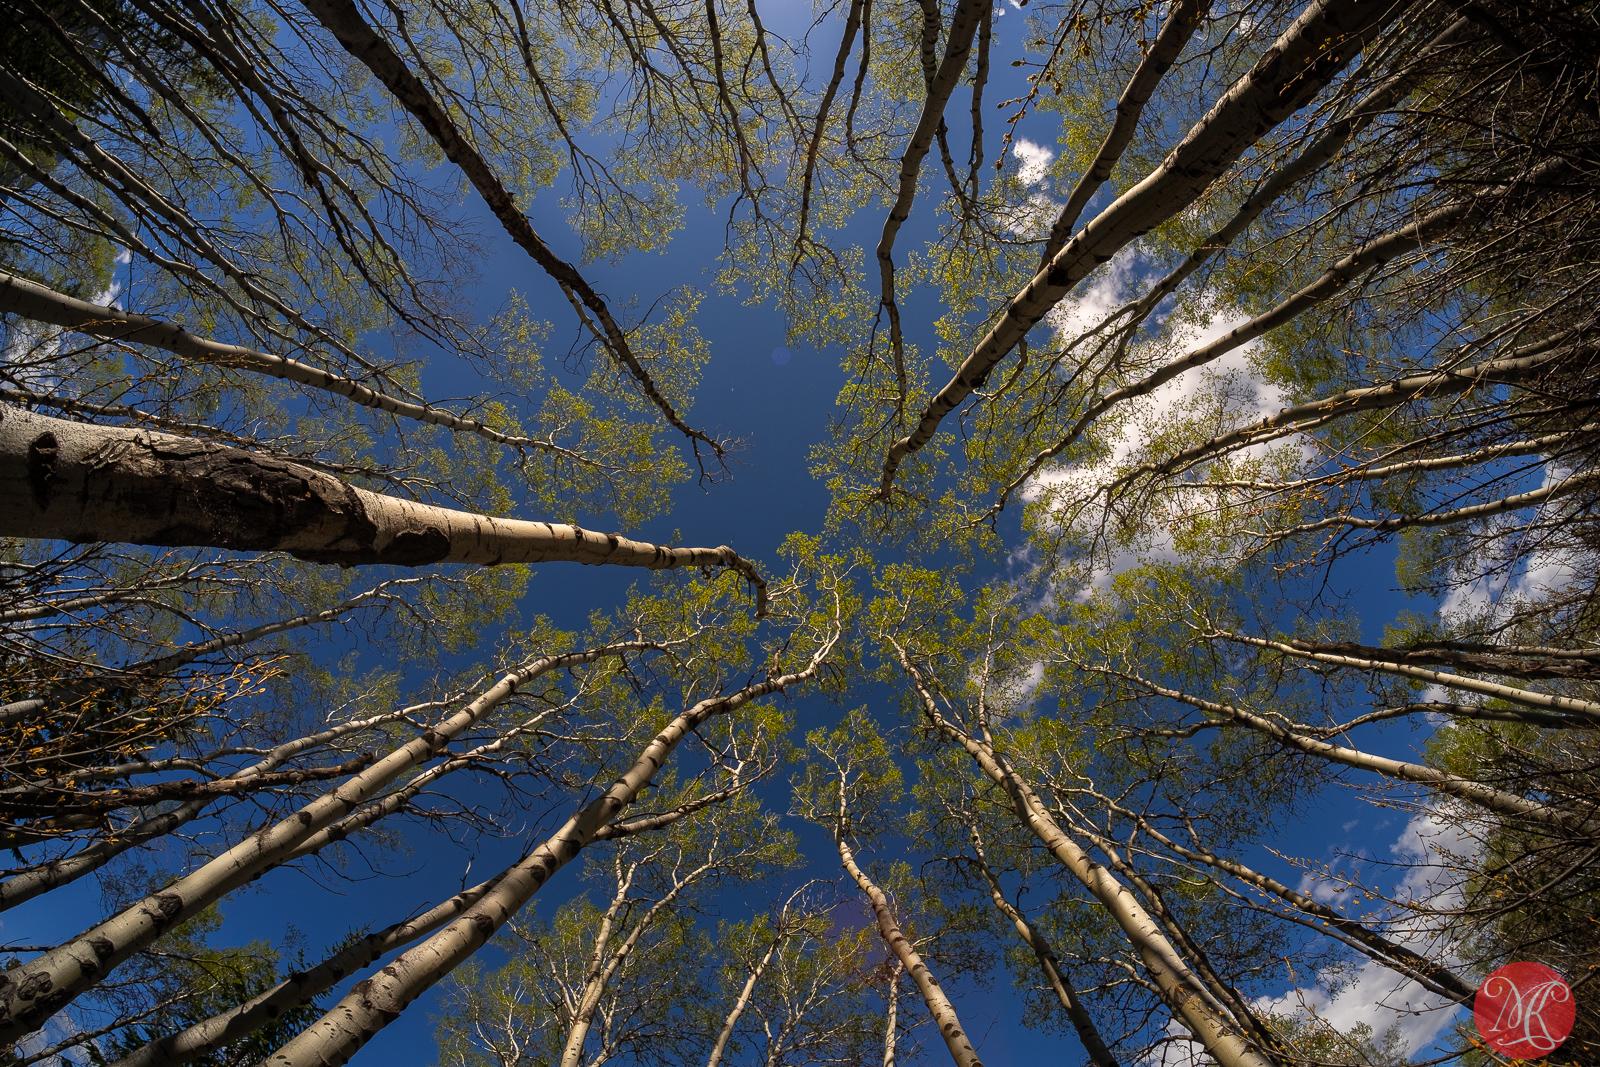 Fabulous trees